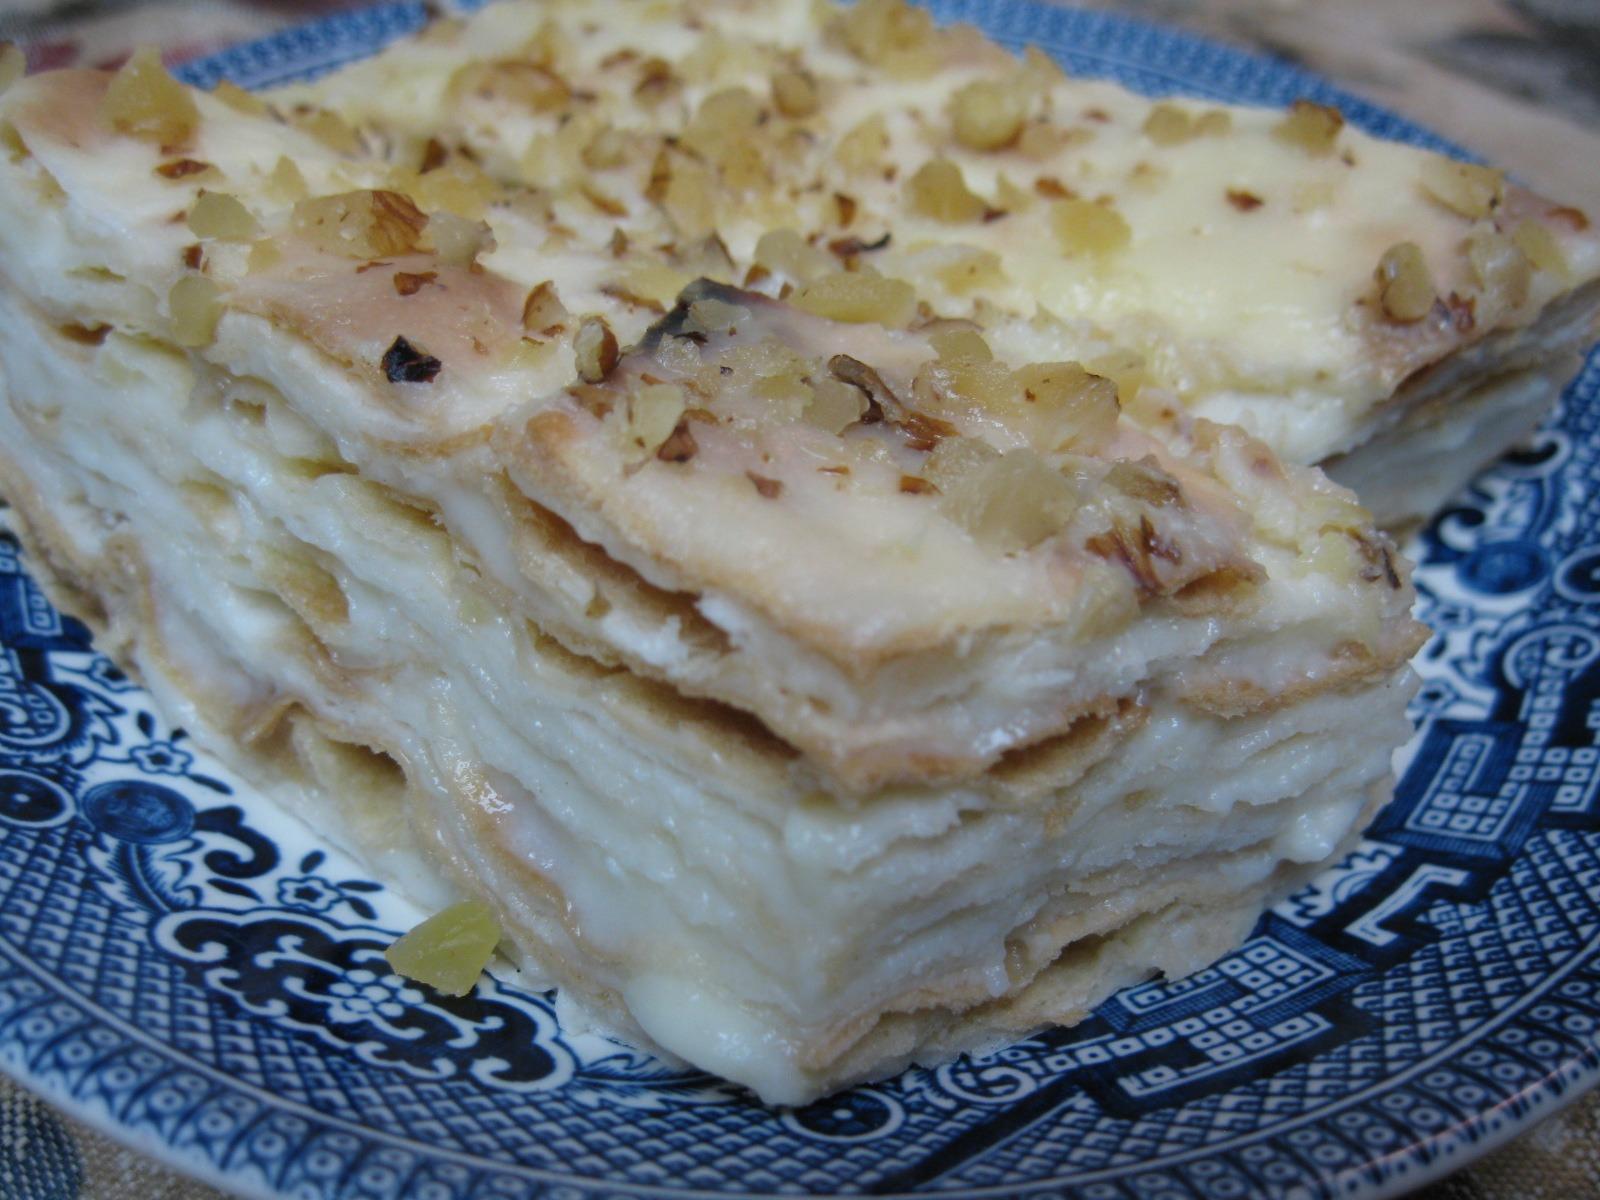 Russian Multi-Layered Lavash Cake